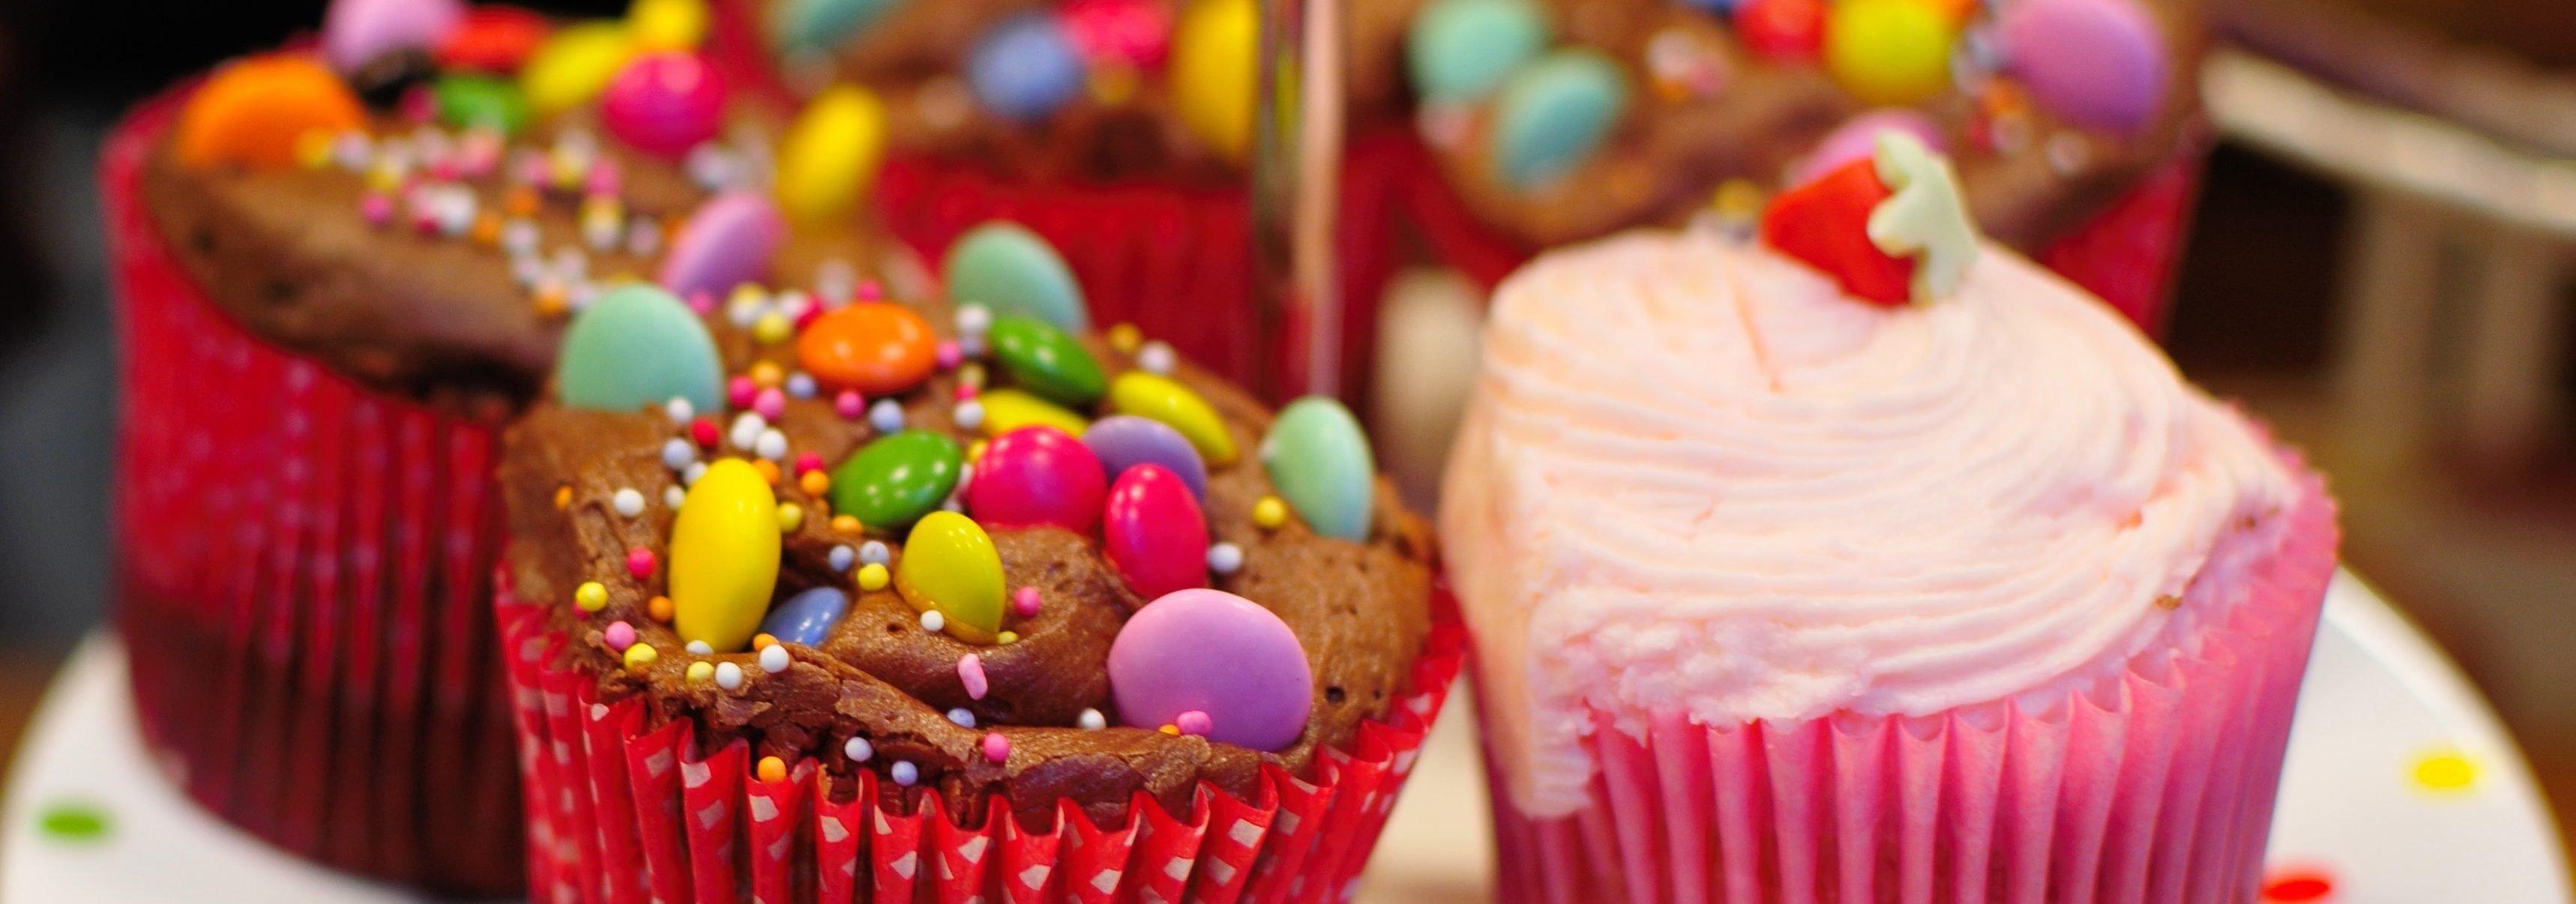 Low Fat Low Sugar Diet